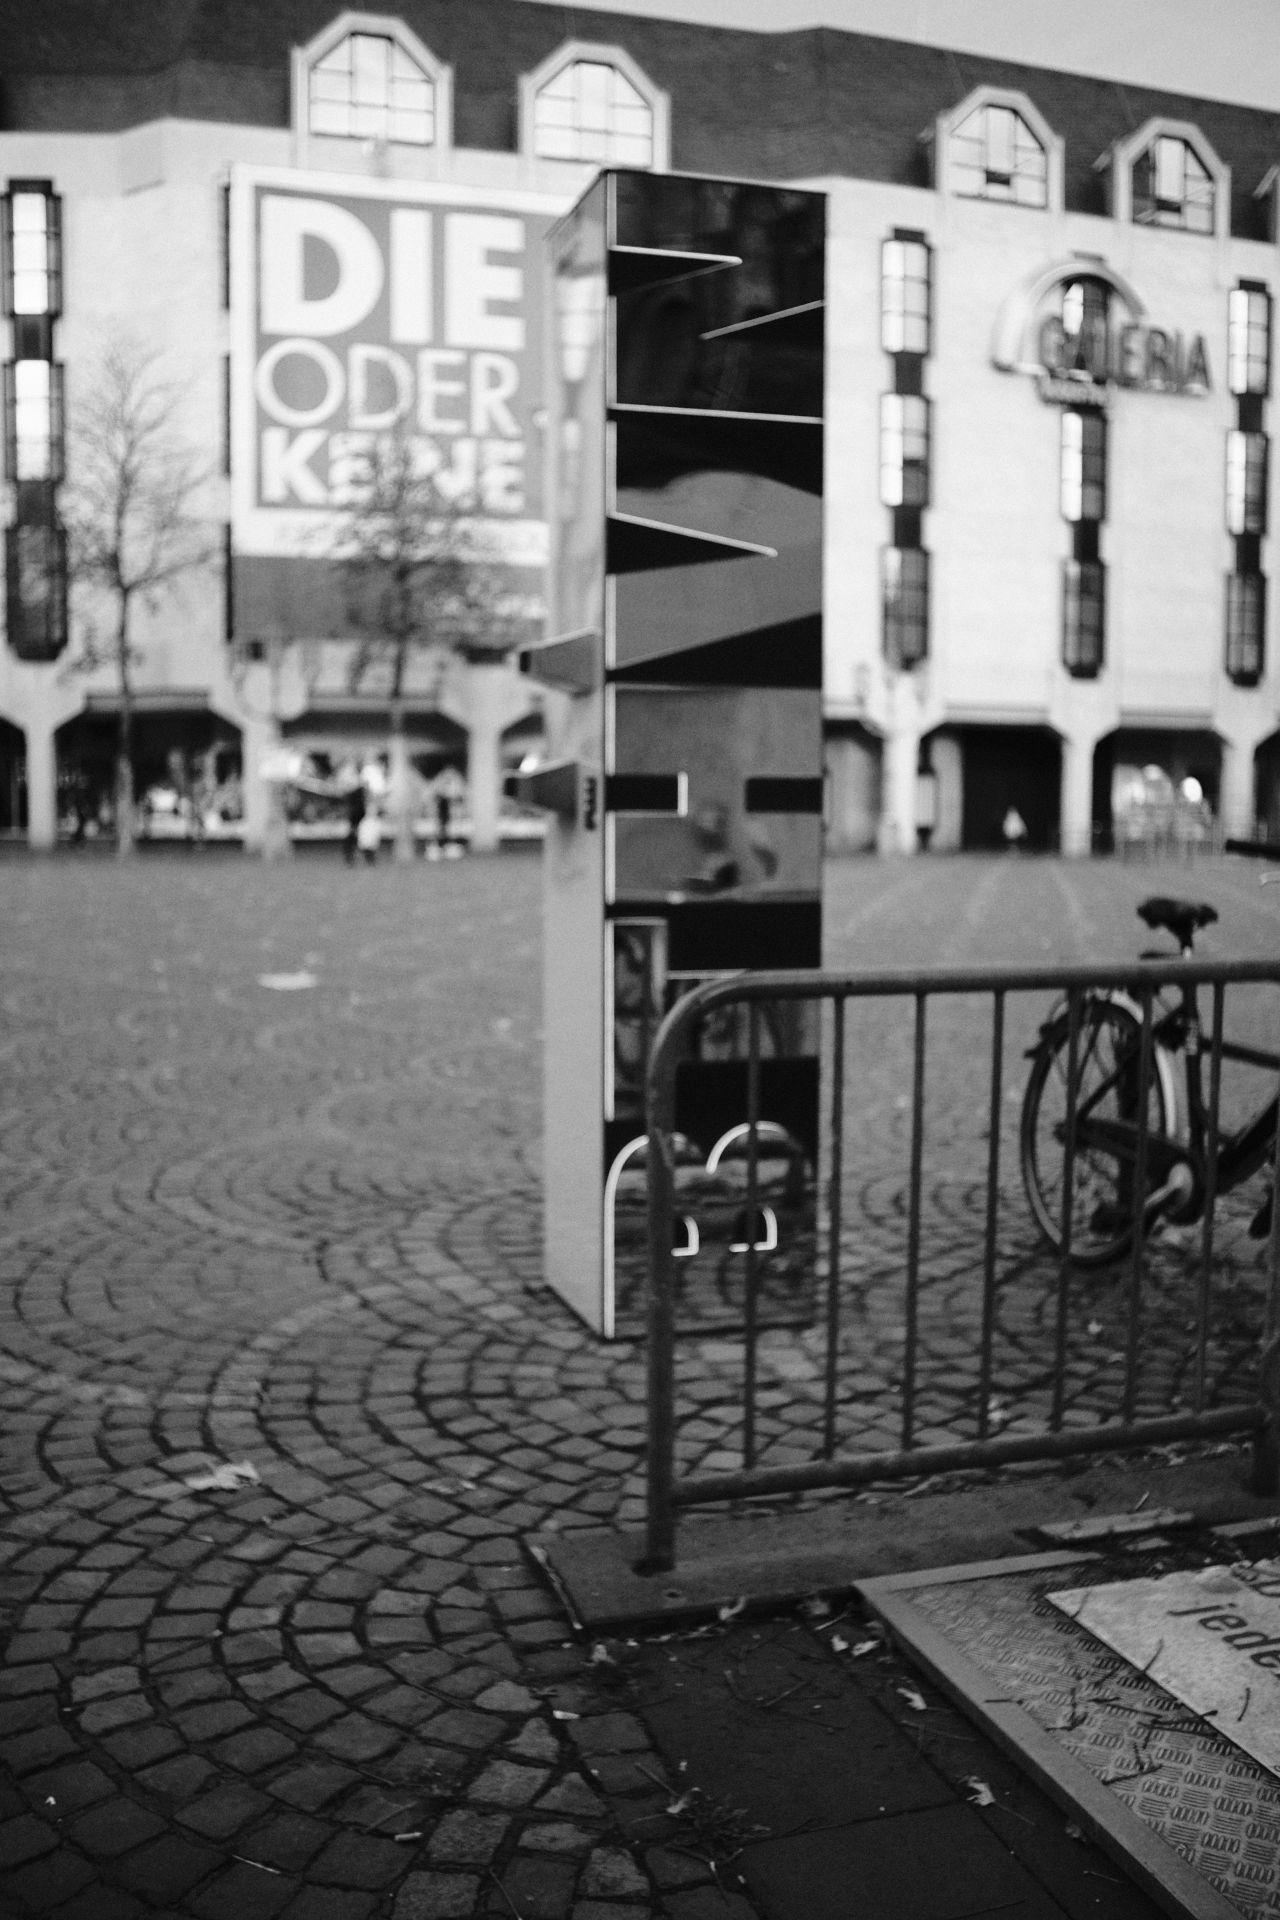 Münsterplatz 1/4400sec ISO-3200 22mm